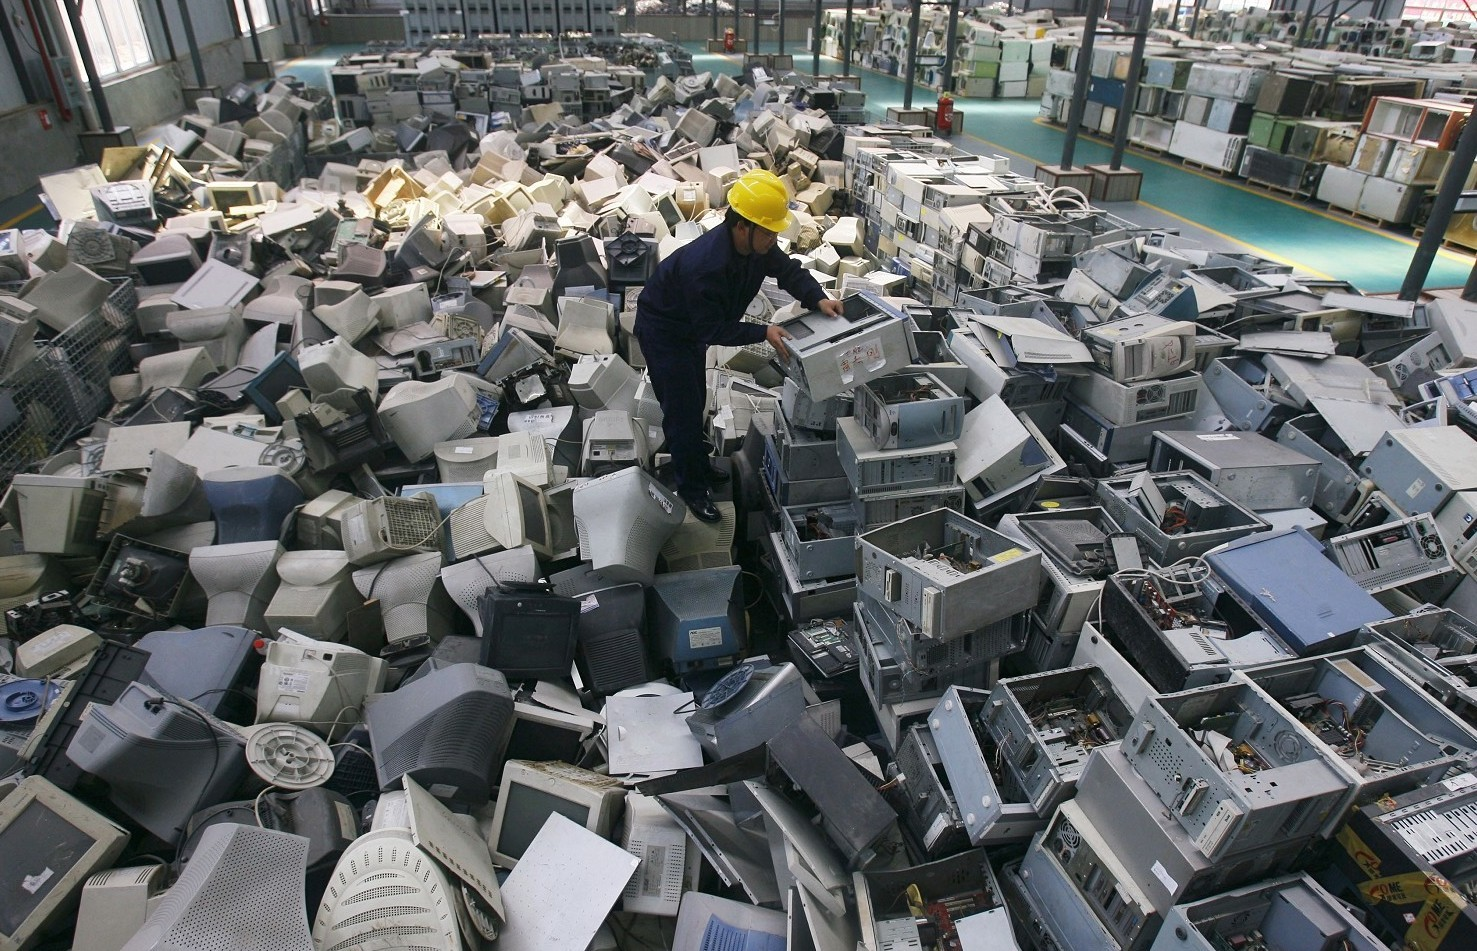 iPhone rallentati e batterie, in Francia